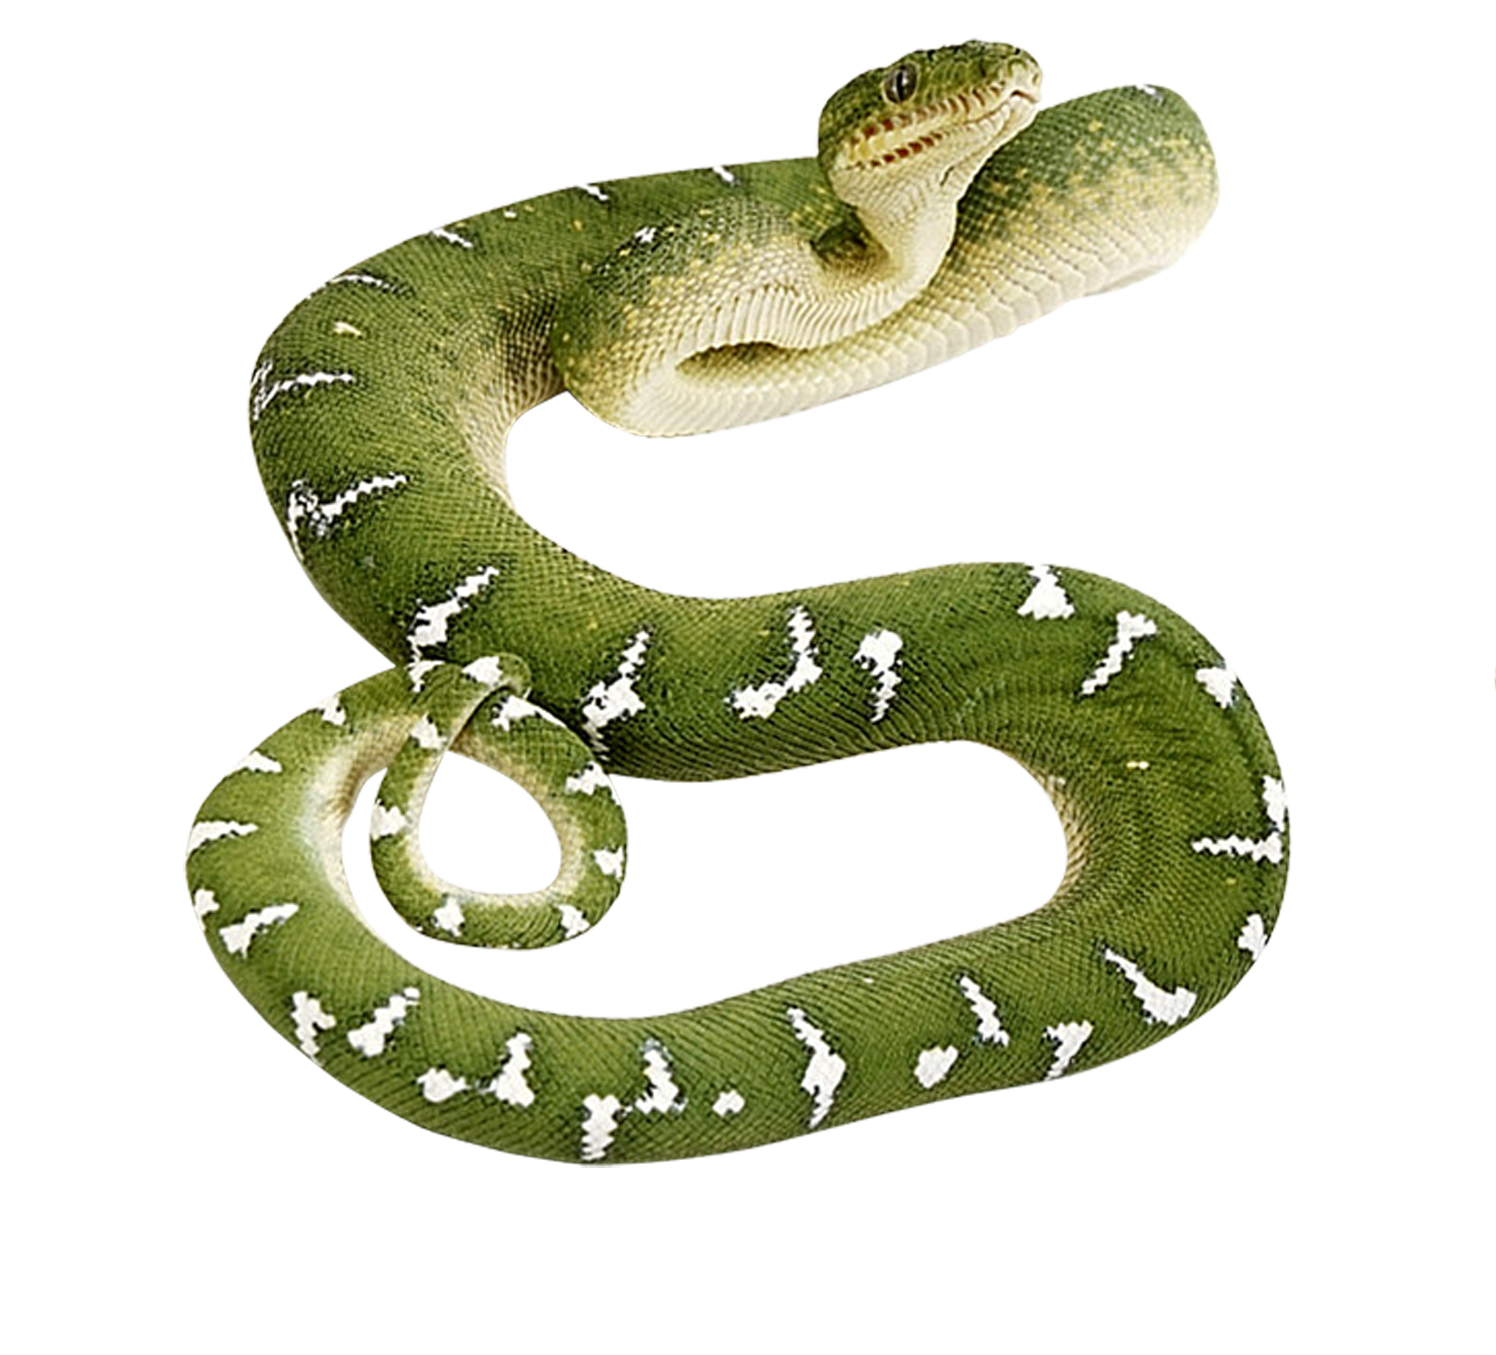 Snake clipart anaconda. Thirty five isolated stock